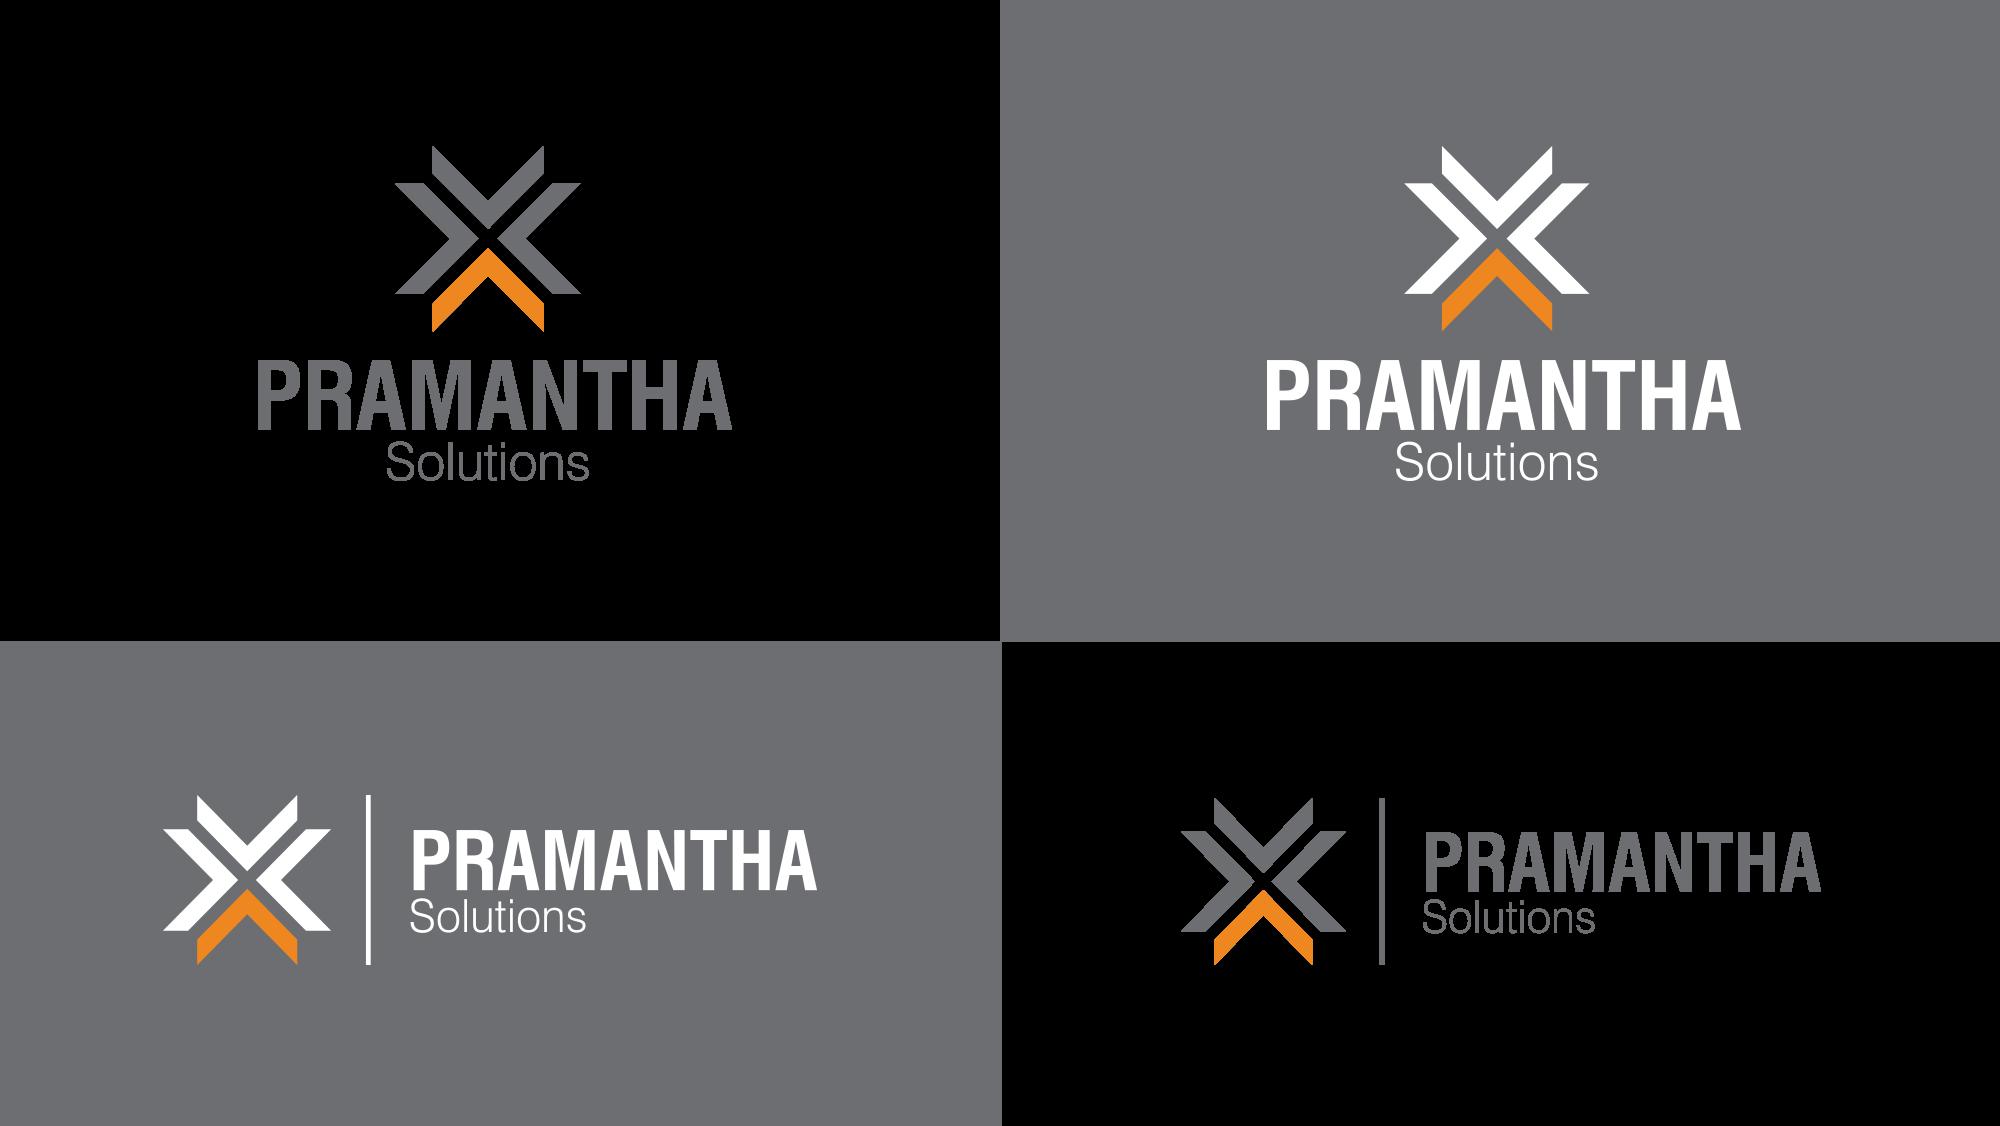 Pramantha Solutions logo variations